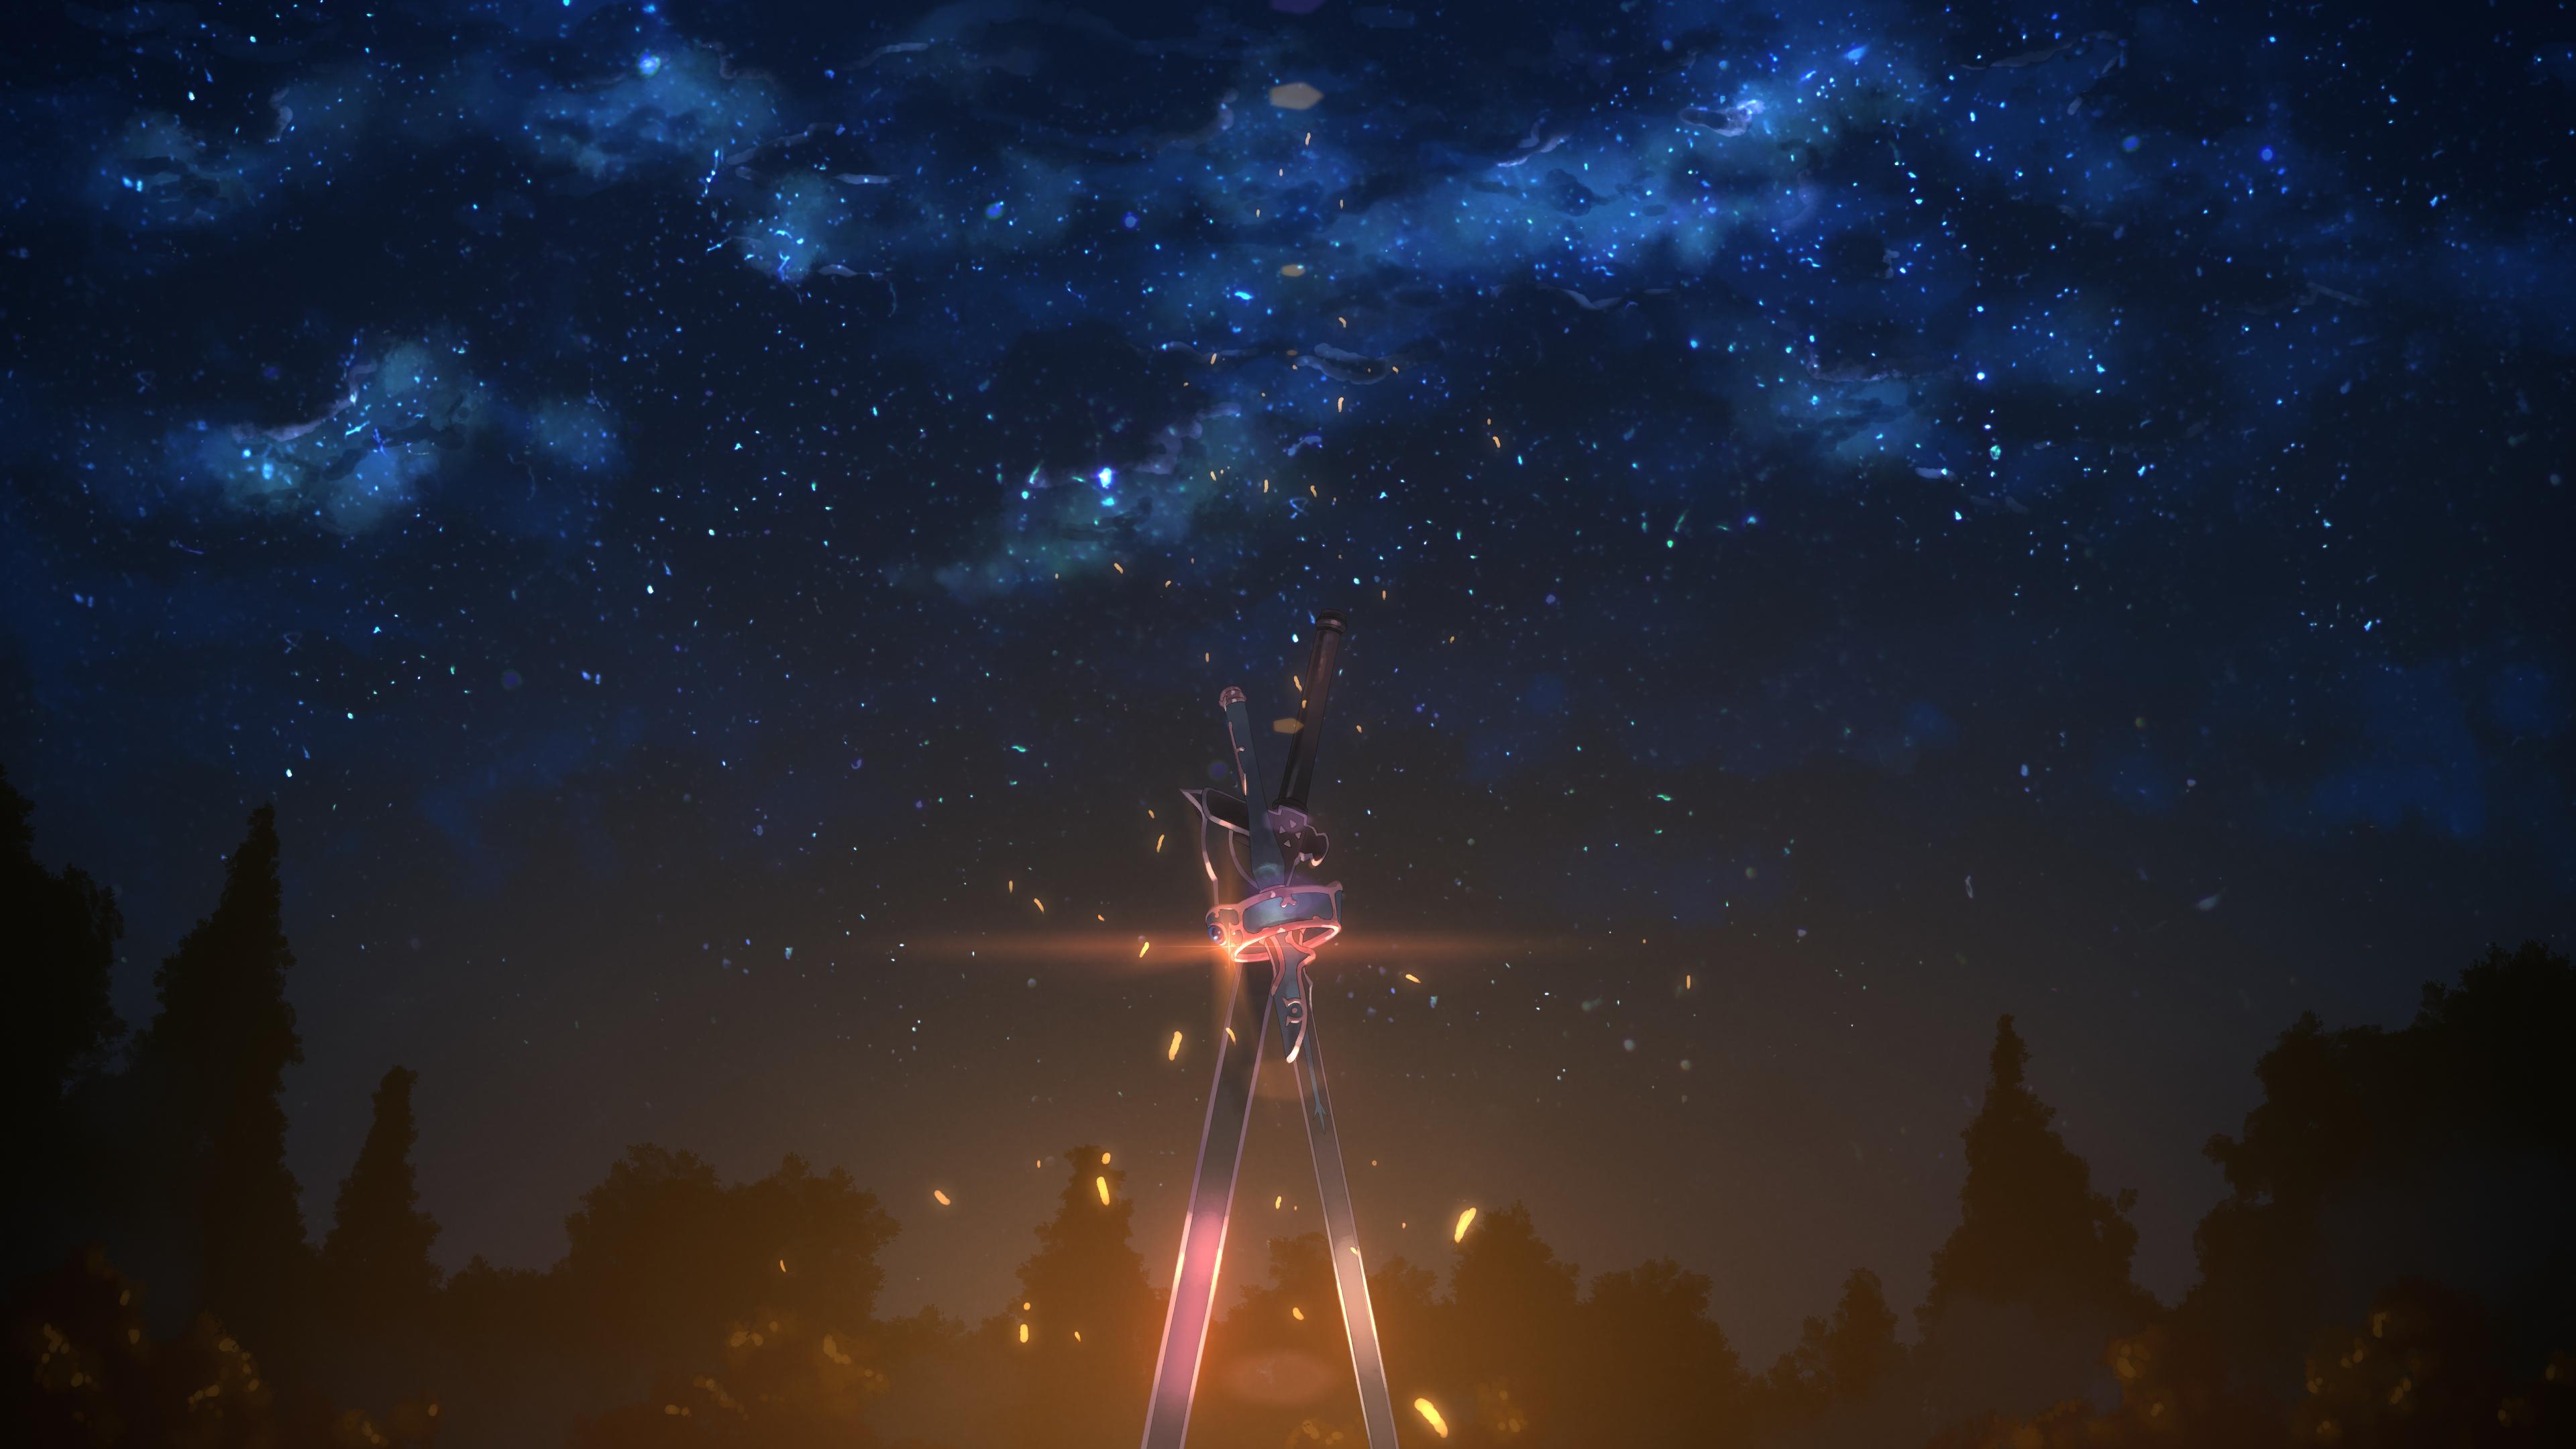 Night Sky Starry Sky Stars Sword Sword Art Online Weapon 3840x2160